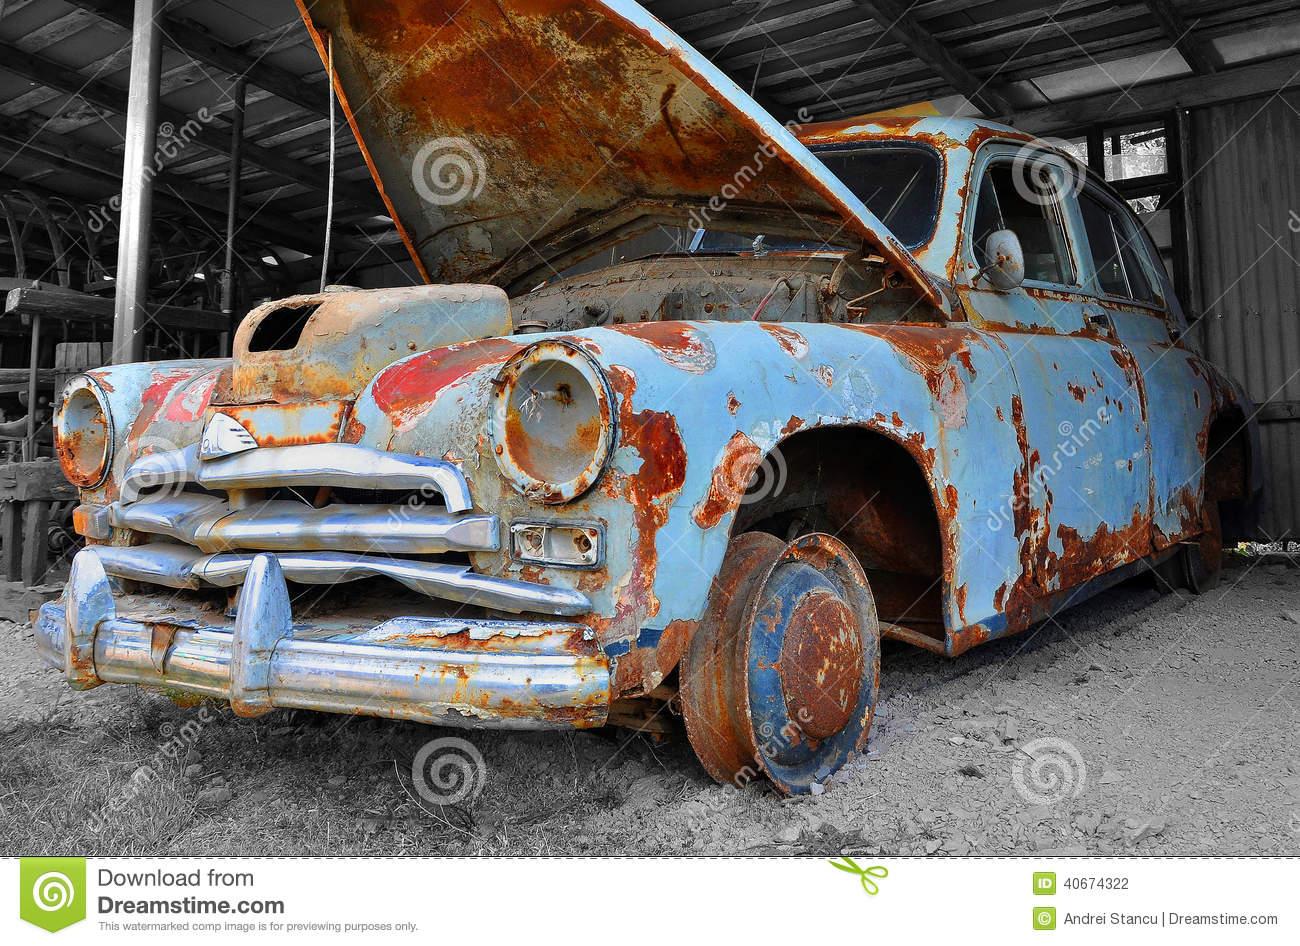 Gaz M20 Pobeda Junk Car Editorial Photography.